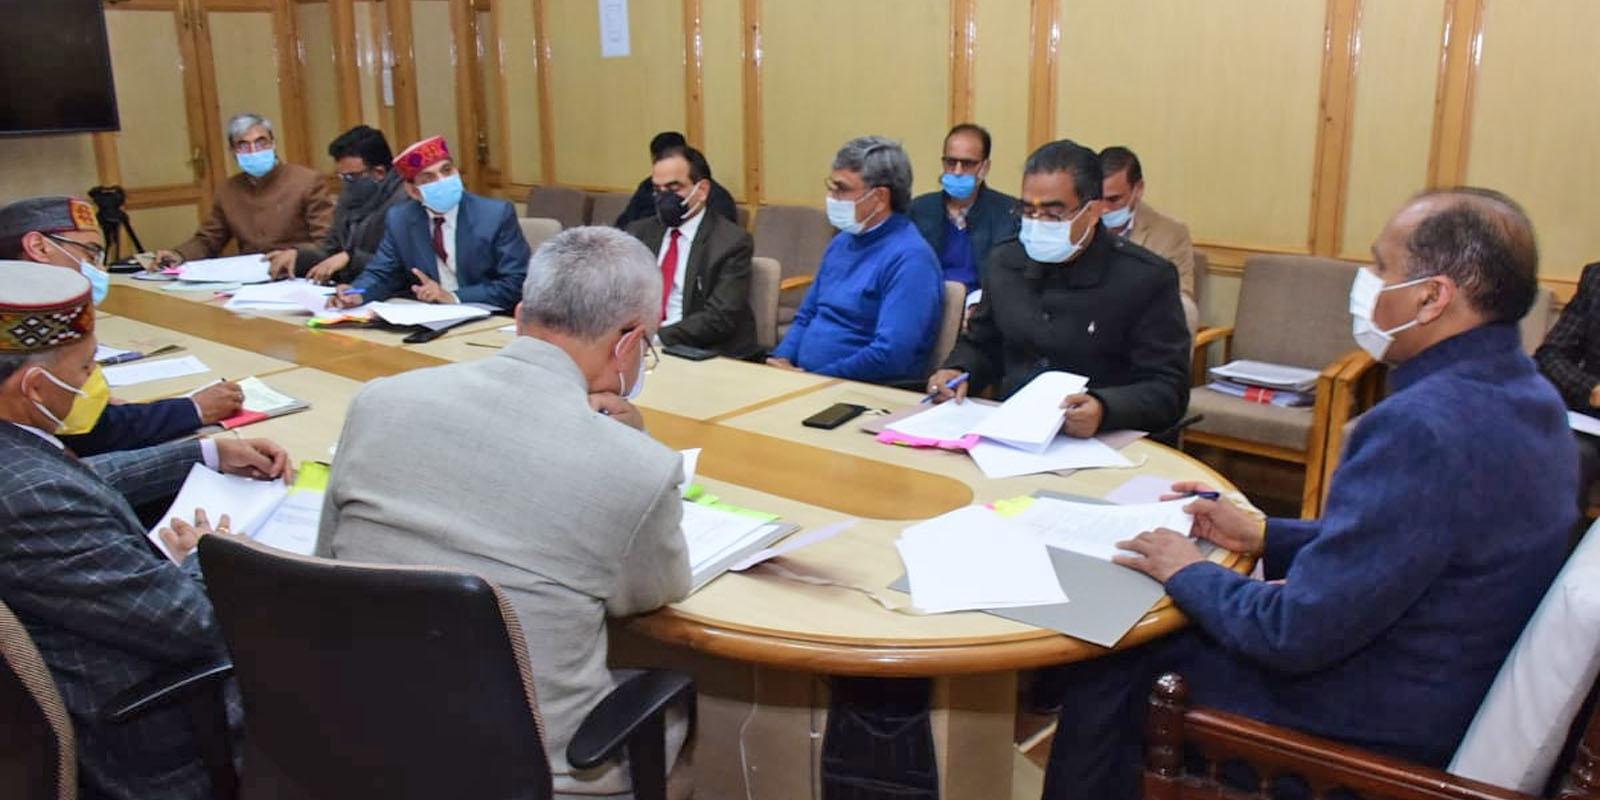 Schools re-opens in Himachal Pradesh pradesh